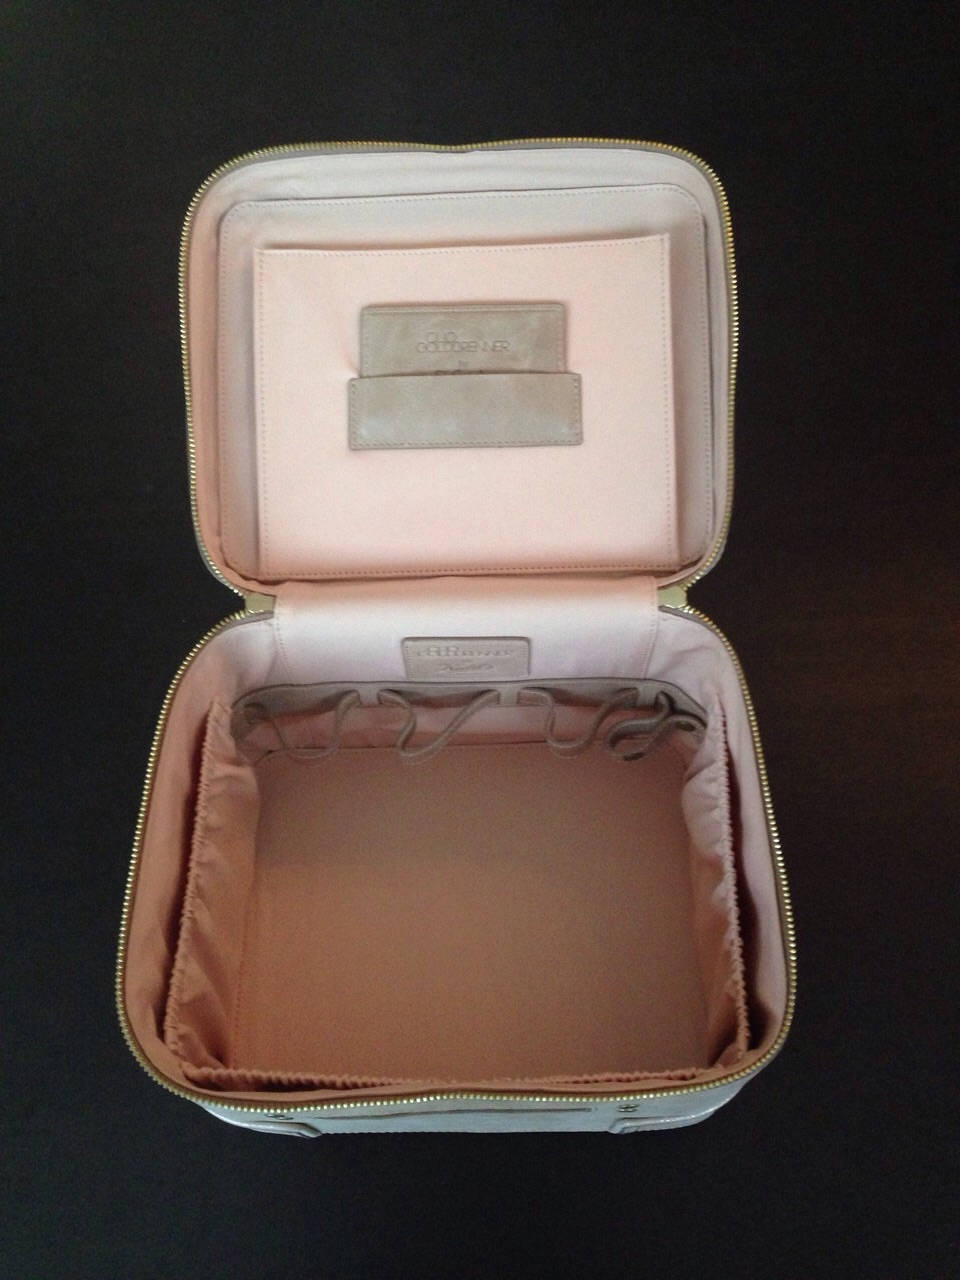 clomid 50 mg